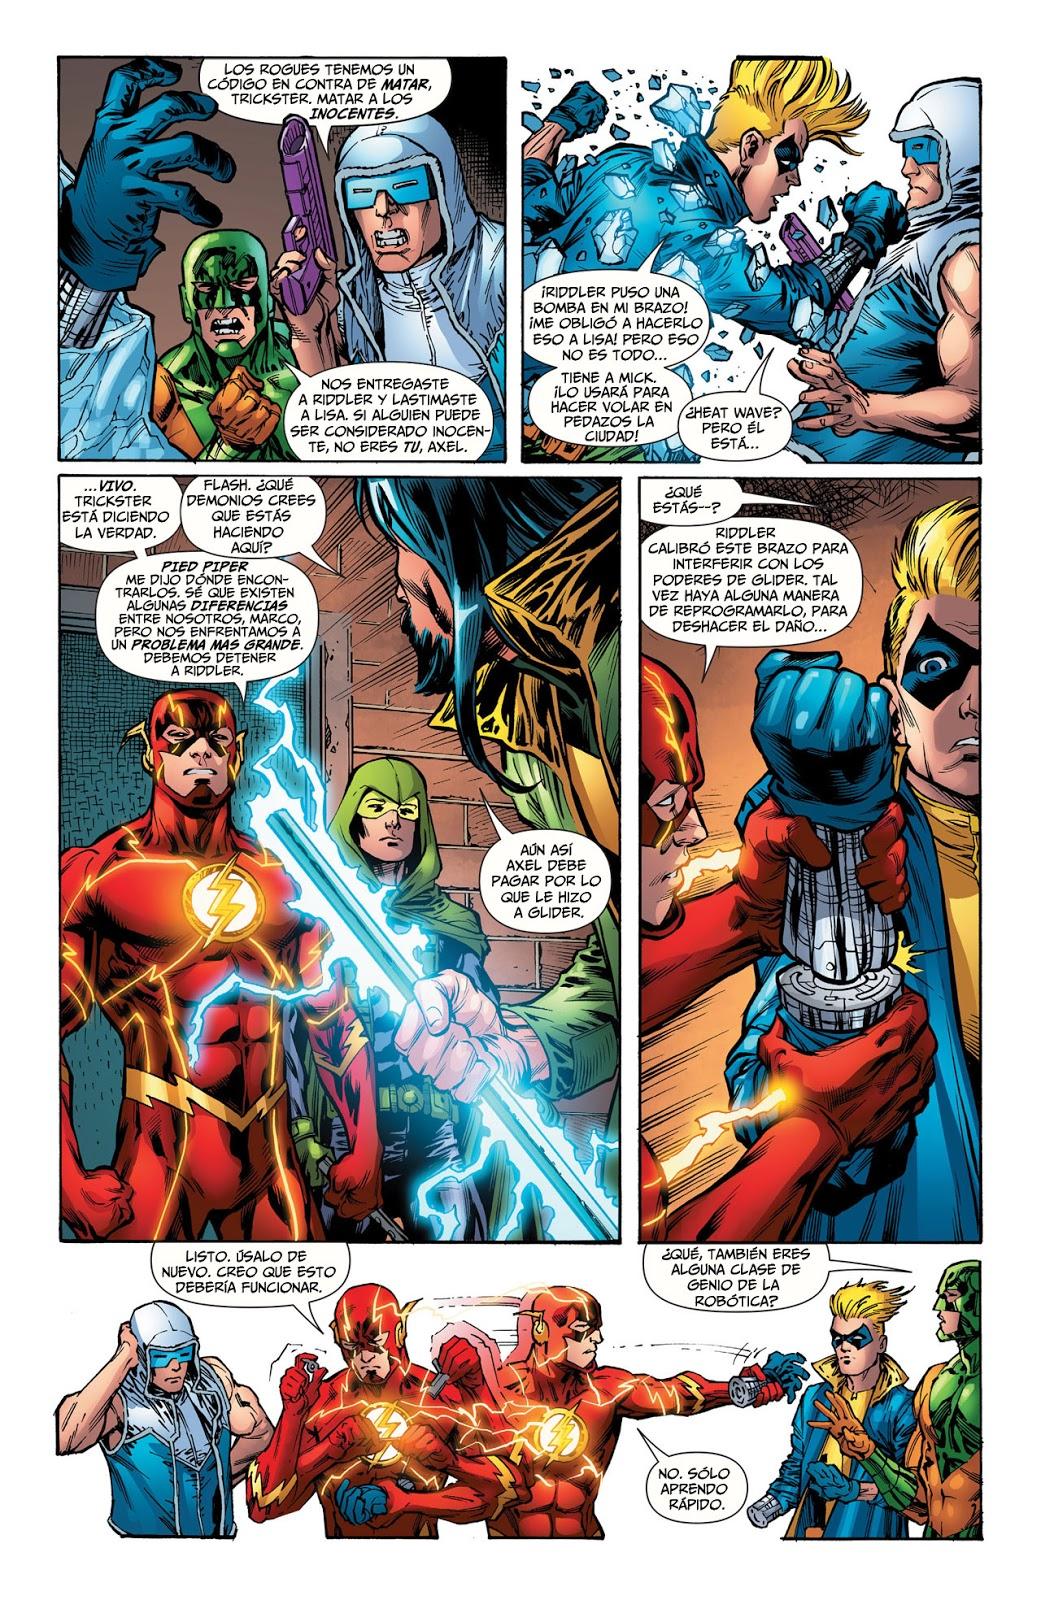 COMIC BOOK FAN AND LOVER: FLASH: PUNTO - DC COMICS